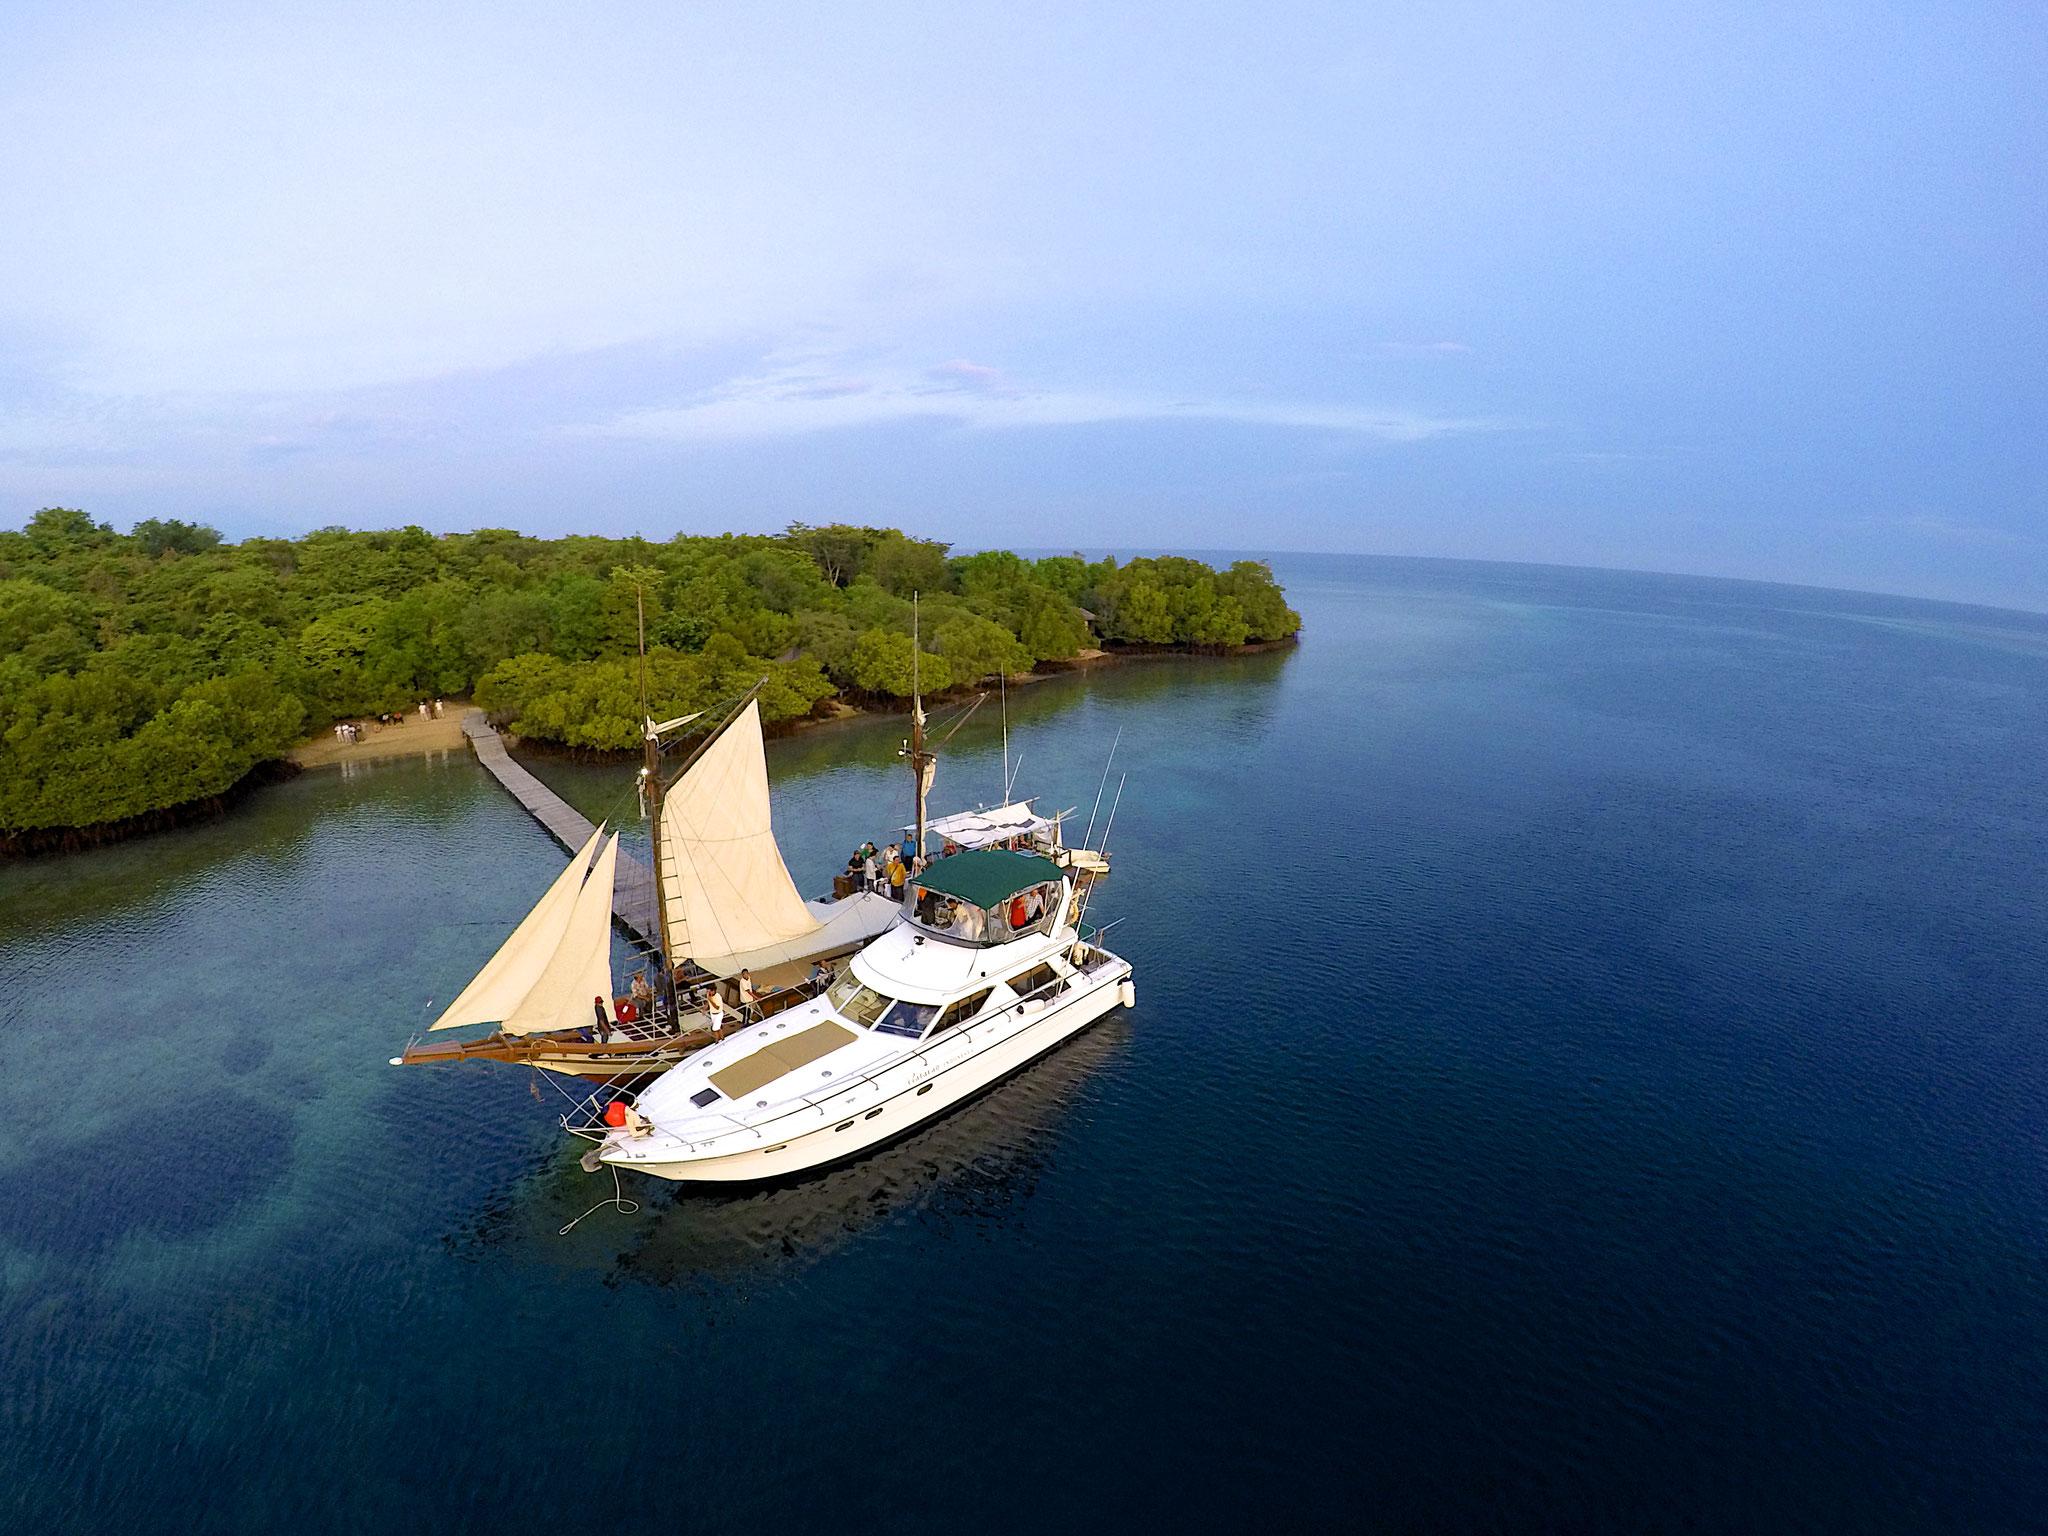 Bootsfahrt, Plataran Menjangan, wunderschönes Resorthotel in Westbali